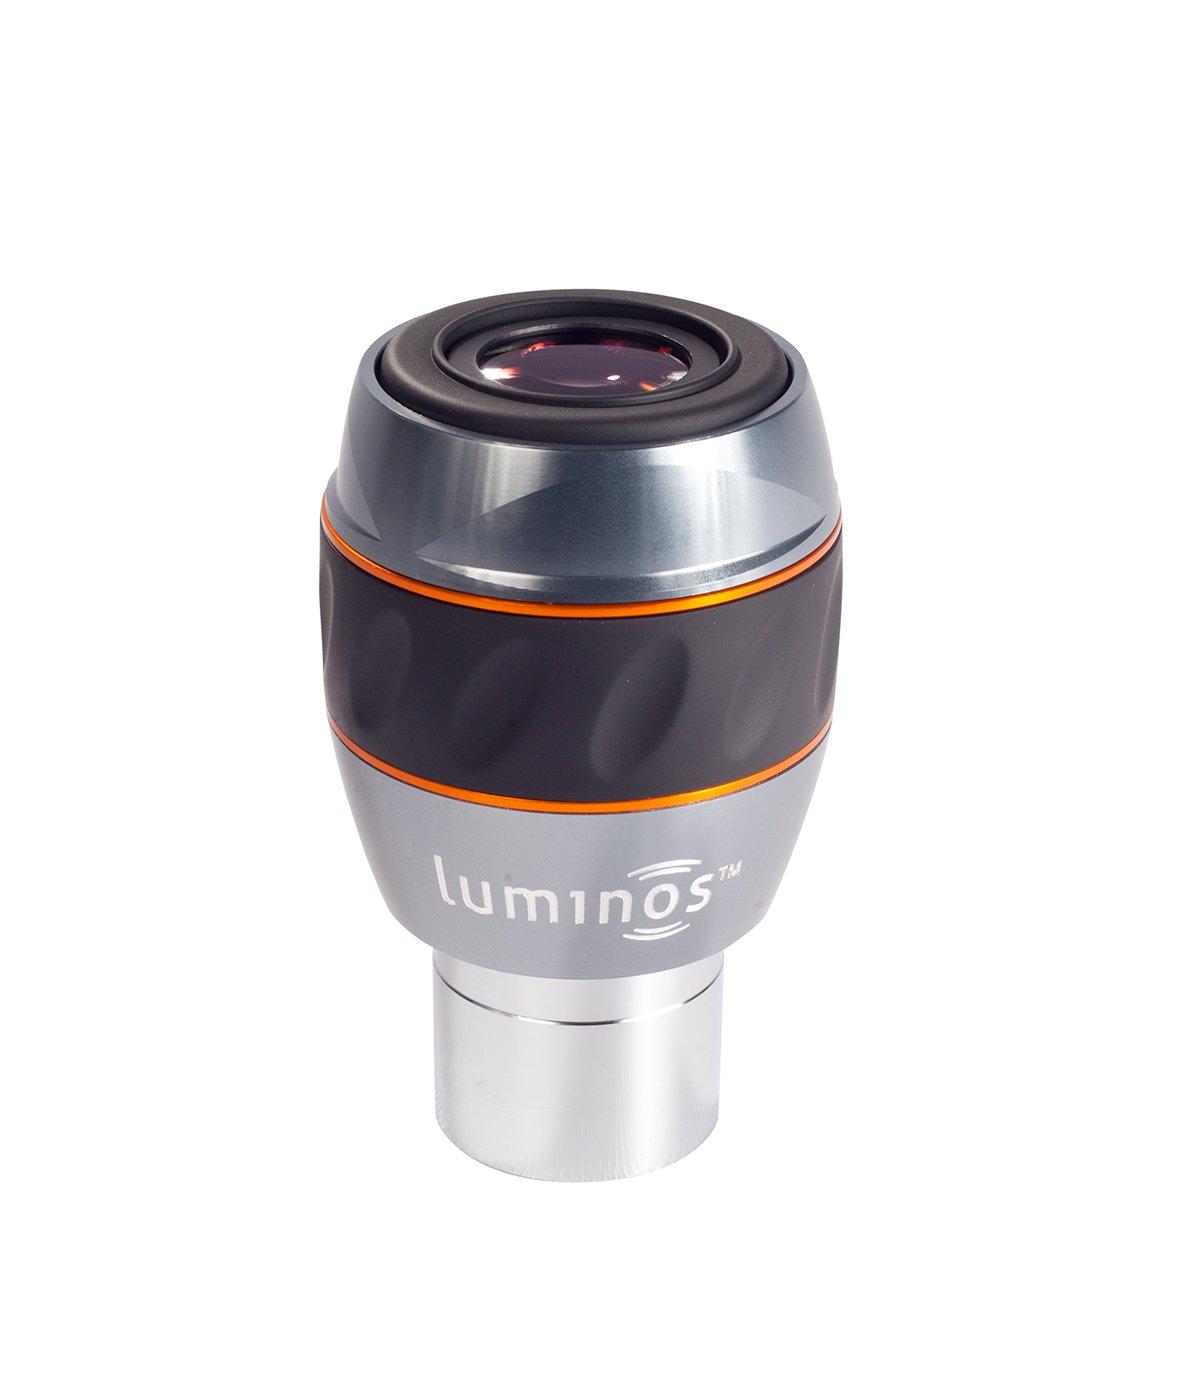 Celestron 93430 Luminos 7mm Eyepiece (Silver/Black)